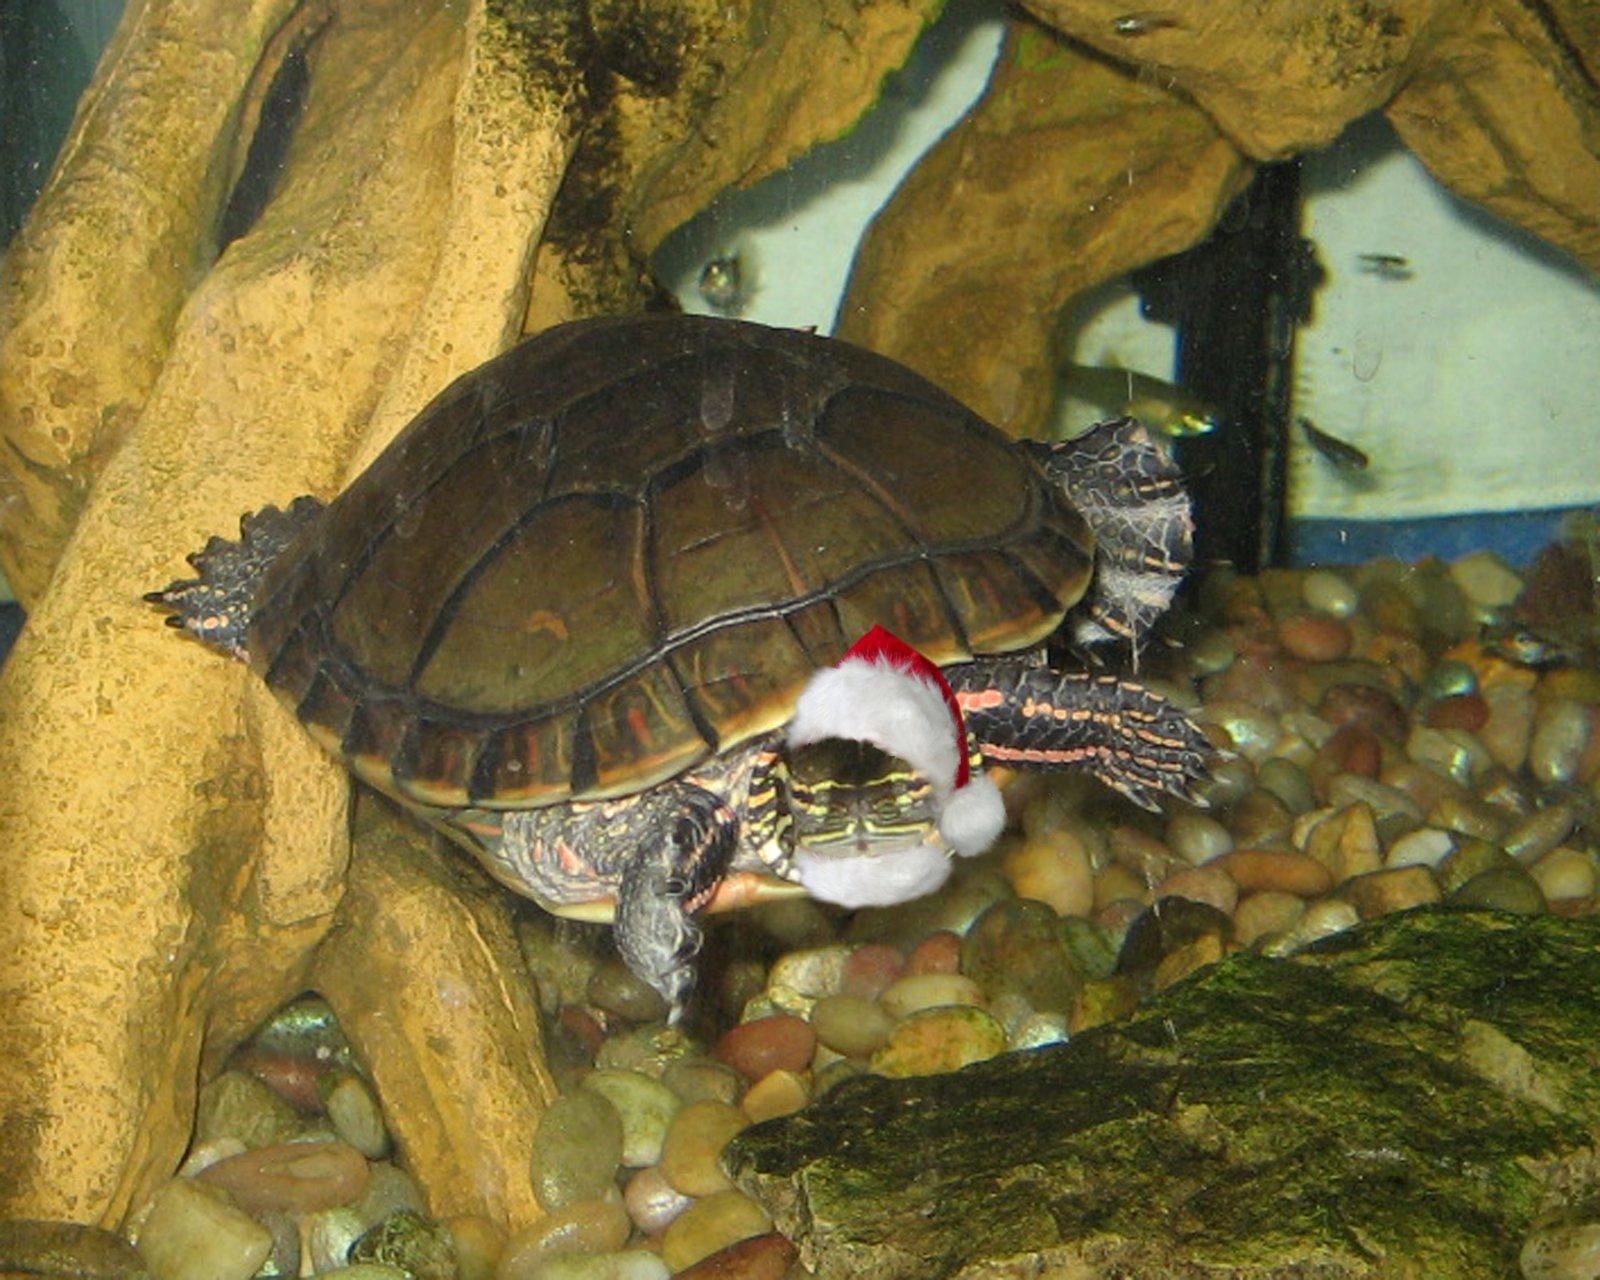 Click image for larger version  Name:turtlesanta.jpg Views:132 Size:331.0 KB ID:117770